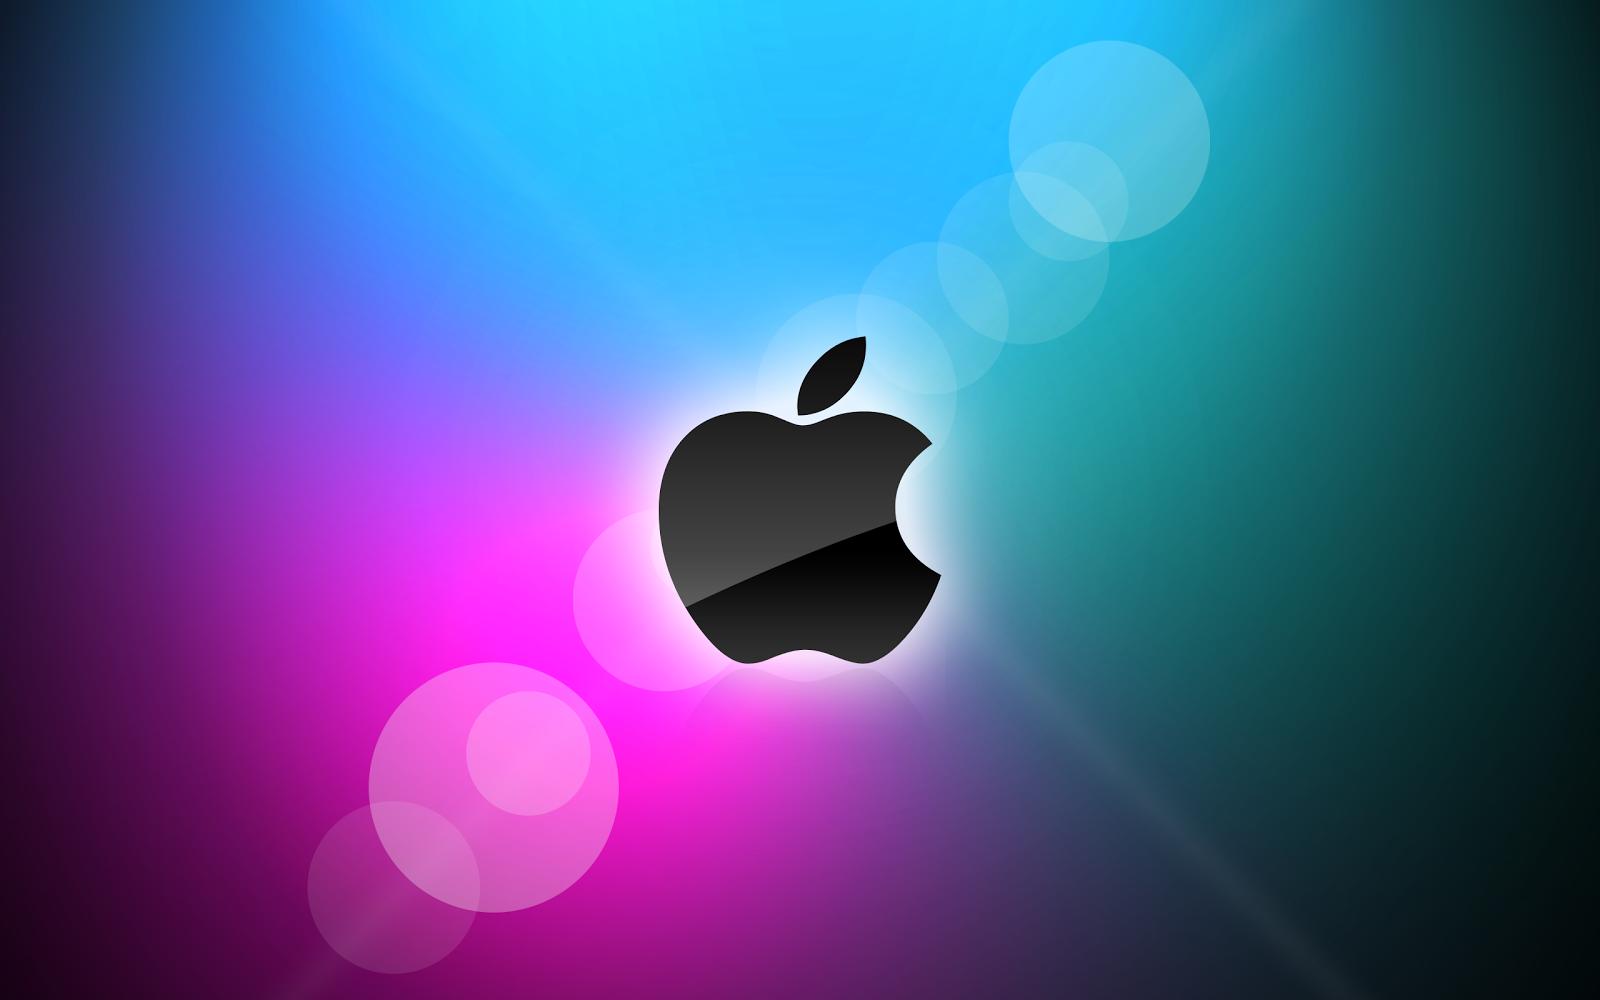 http://2.bp.blogspot.com/-TvgCAujK--8/UNqx59XdBkI/AAAAAAAADiI/Yj5UpYmyTVA/s1600/apple-mac-high-resolution-wallpaper-1.png